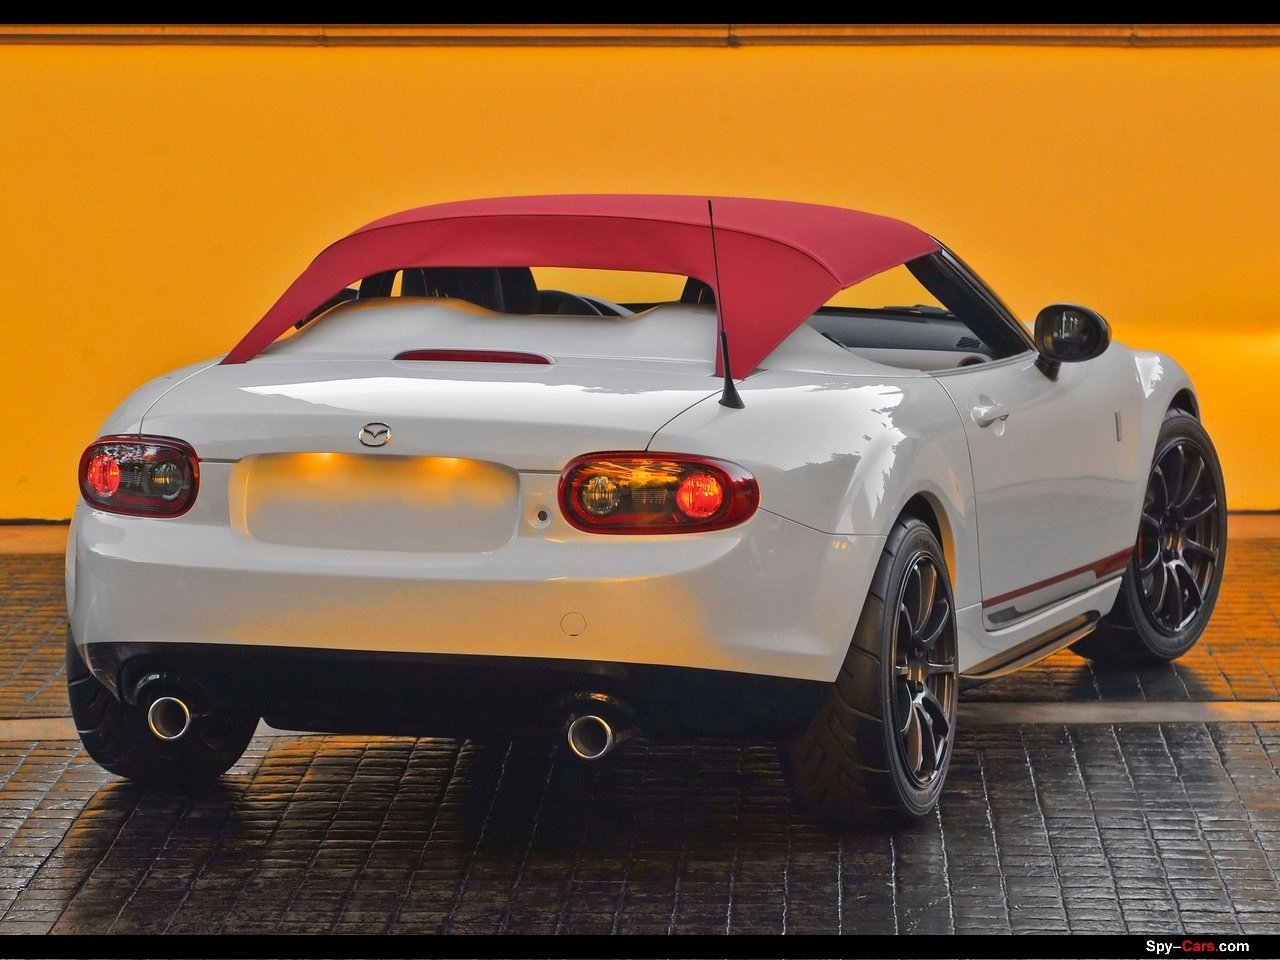 http://2.bp.blogspot.com/-rZwgB5oNEbA/TrO8lTy_9qI/AAAAAAACRVE/kpafqBoTLgo/s1600/Mazda-MX-5_Spyder_Concept_2011_007.jpg